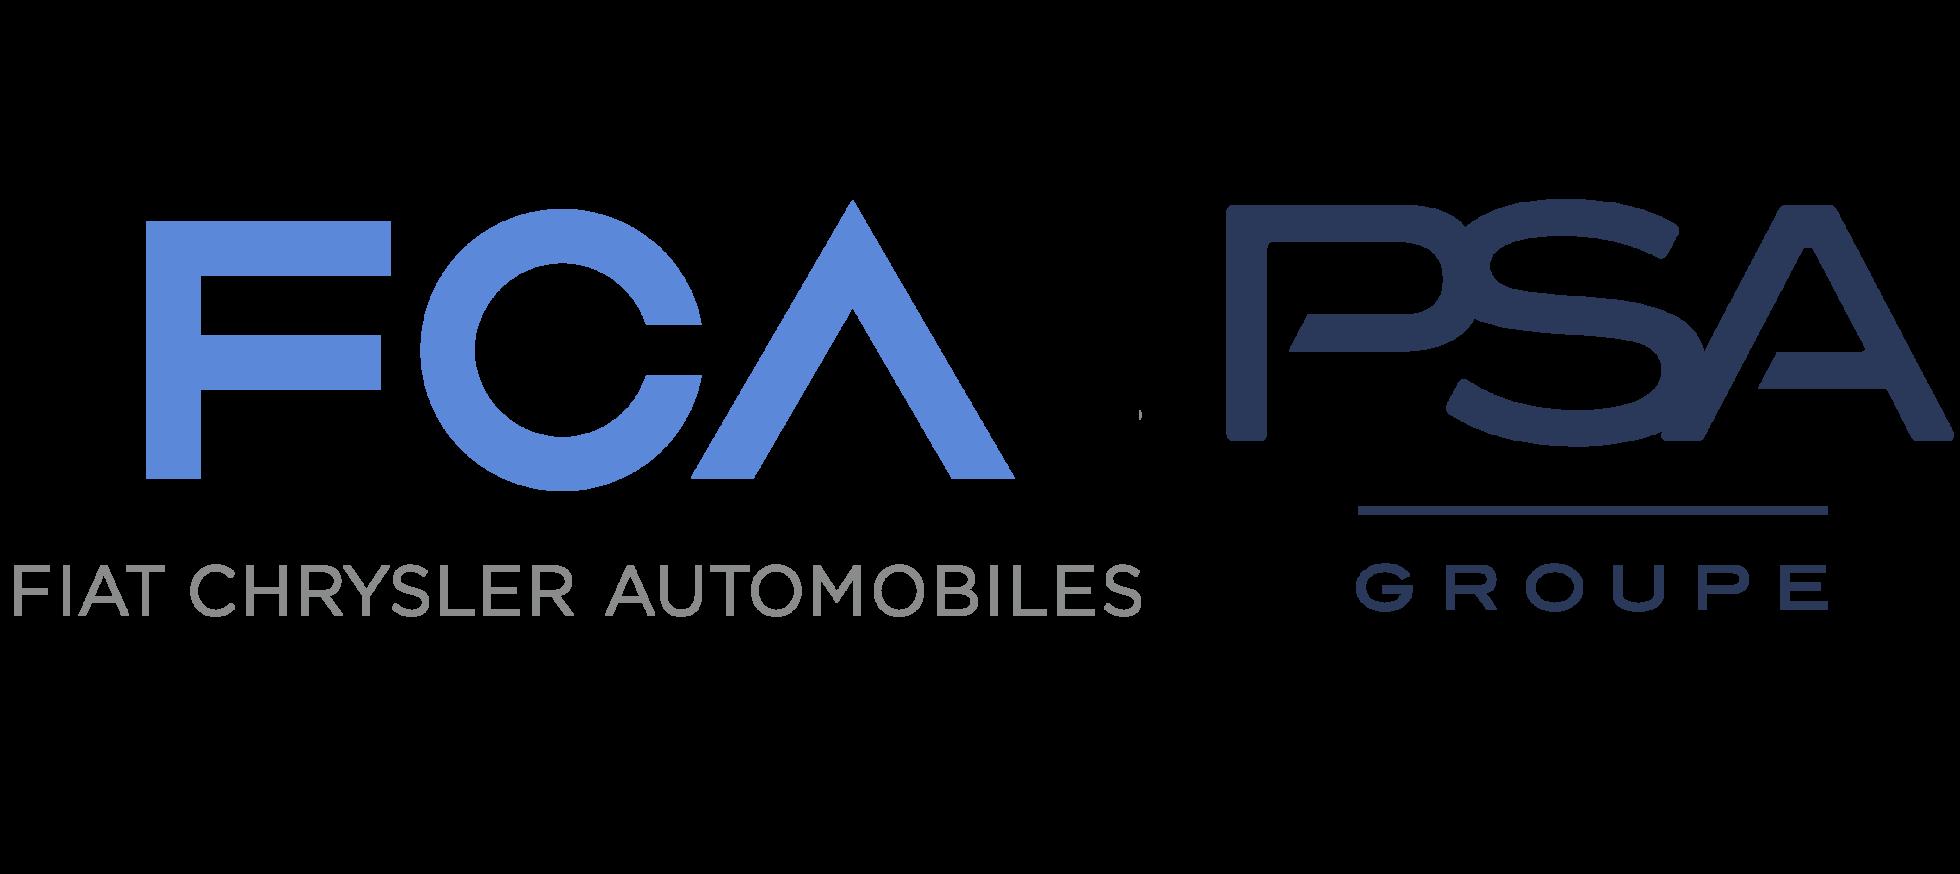 Fusione tra Fiat Chrysler Automobiles e Groupe PSA (Peugeot)